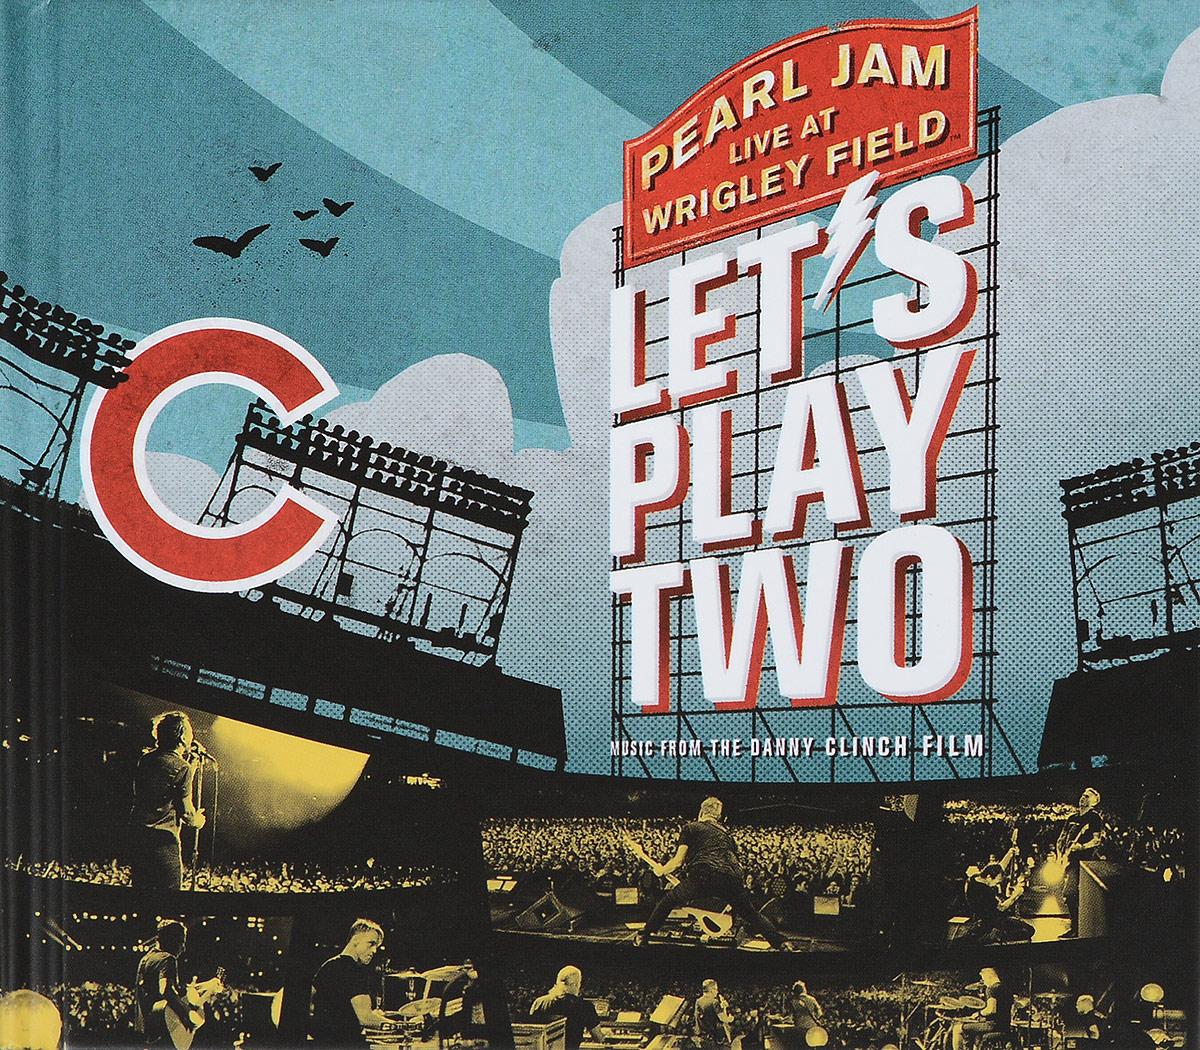 Pearl Jam Pearl Jam. Let's Play Two pearl jam pearl jam lightning bolt